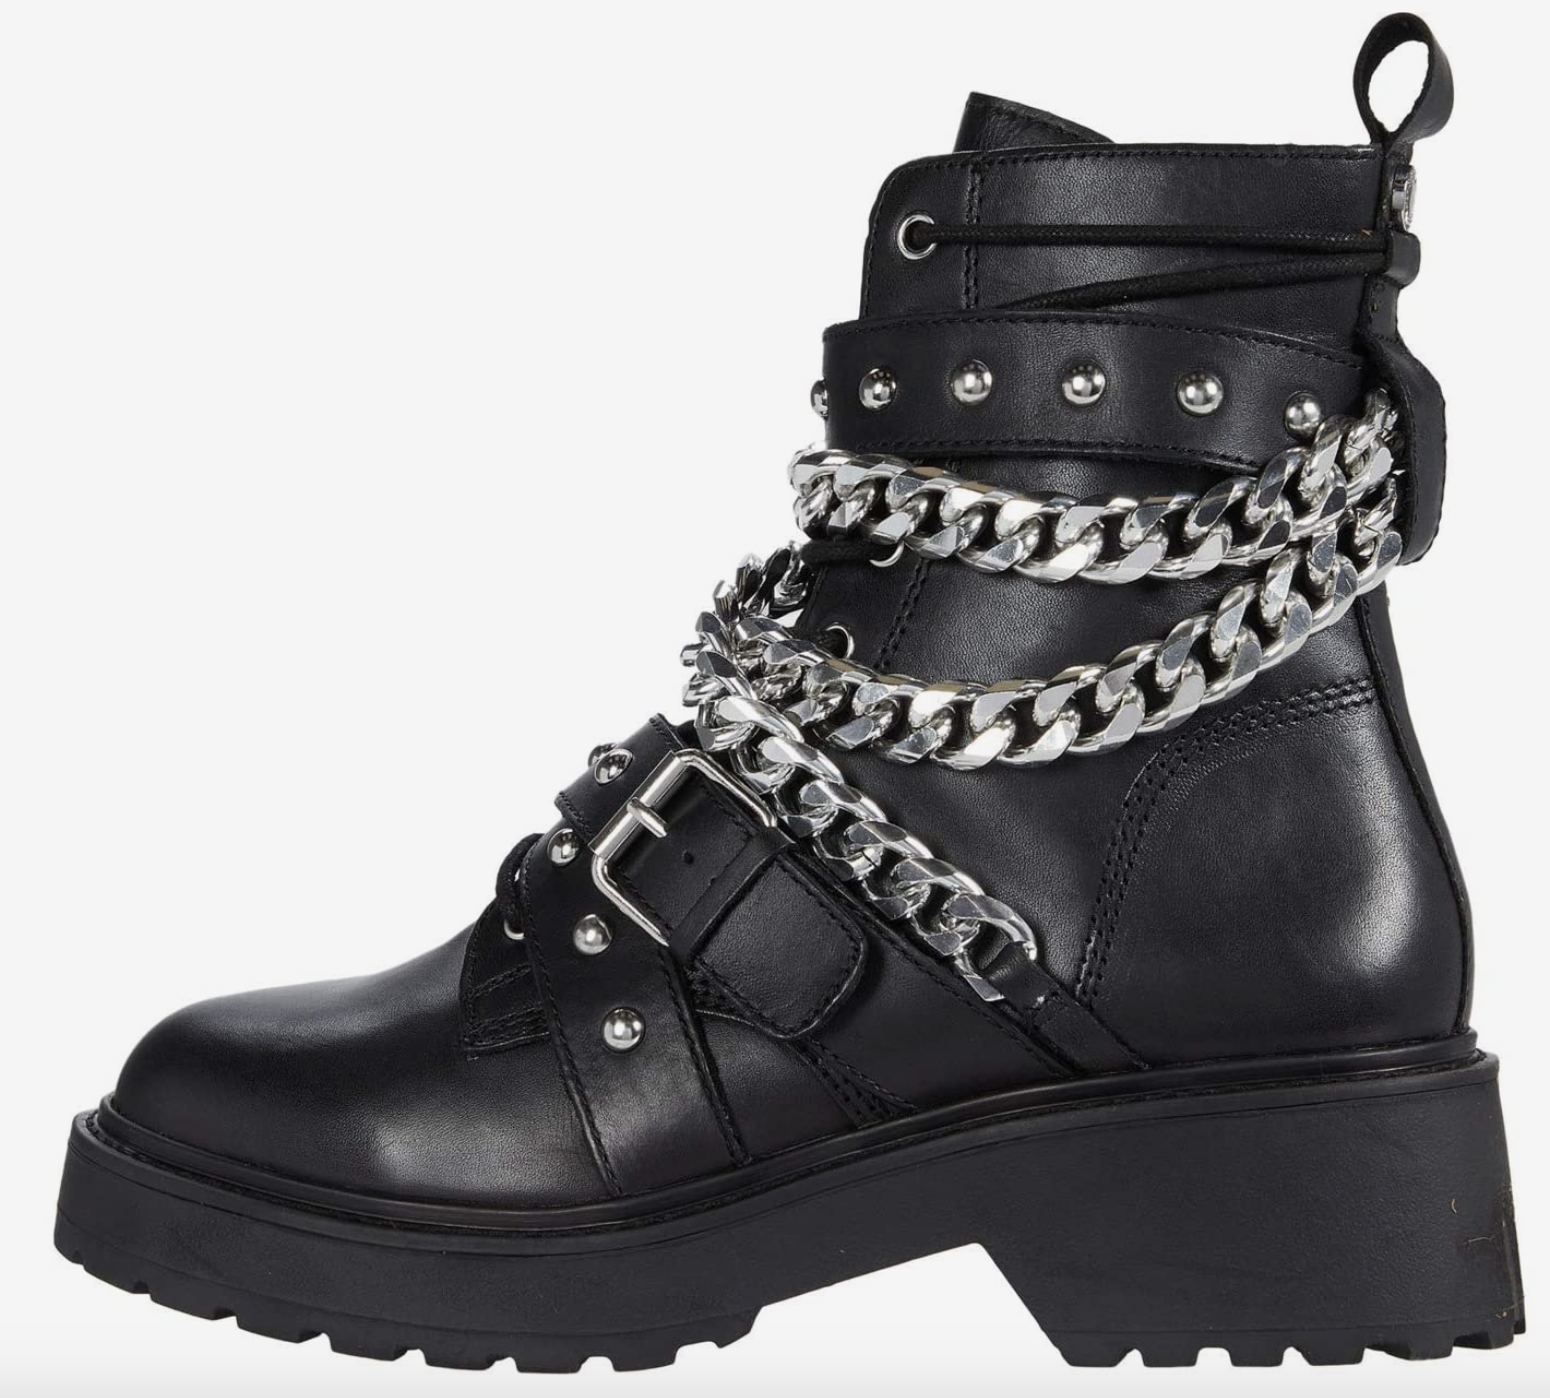 Steve Madden, lug-sole boots